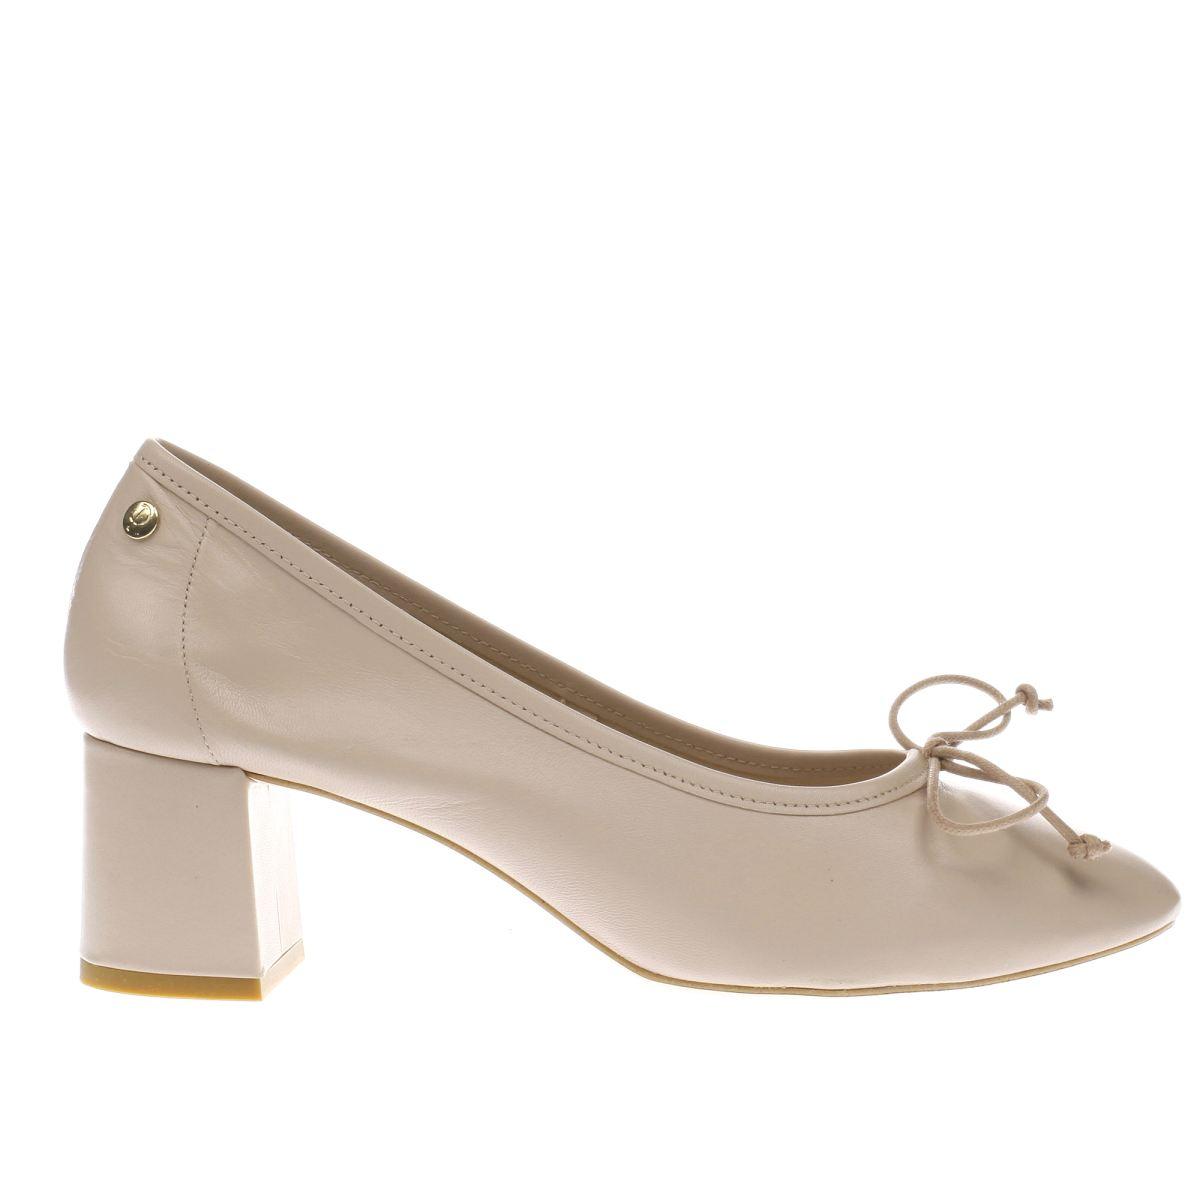 Black sandals littlewoods - Red Or Dead Pale Pink Dahlia Womens Low Heels